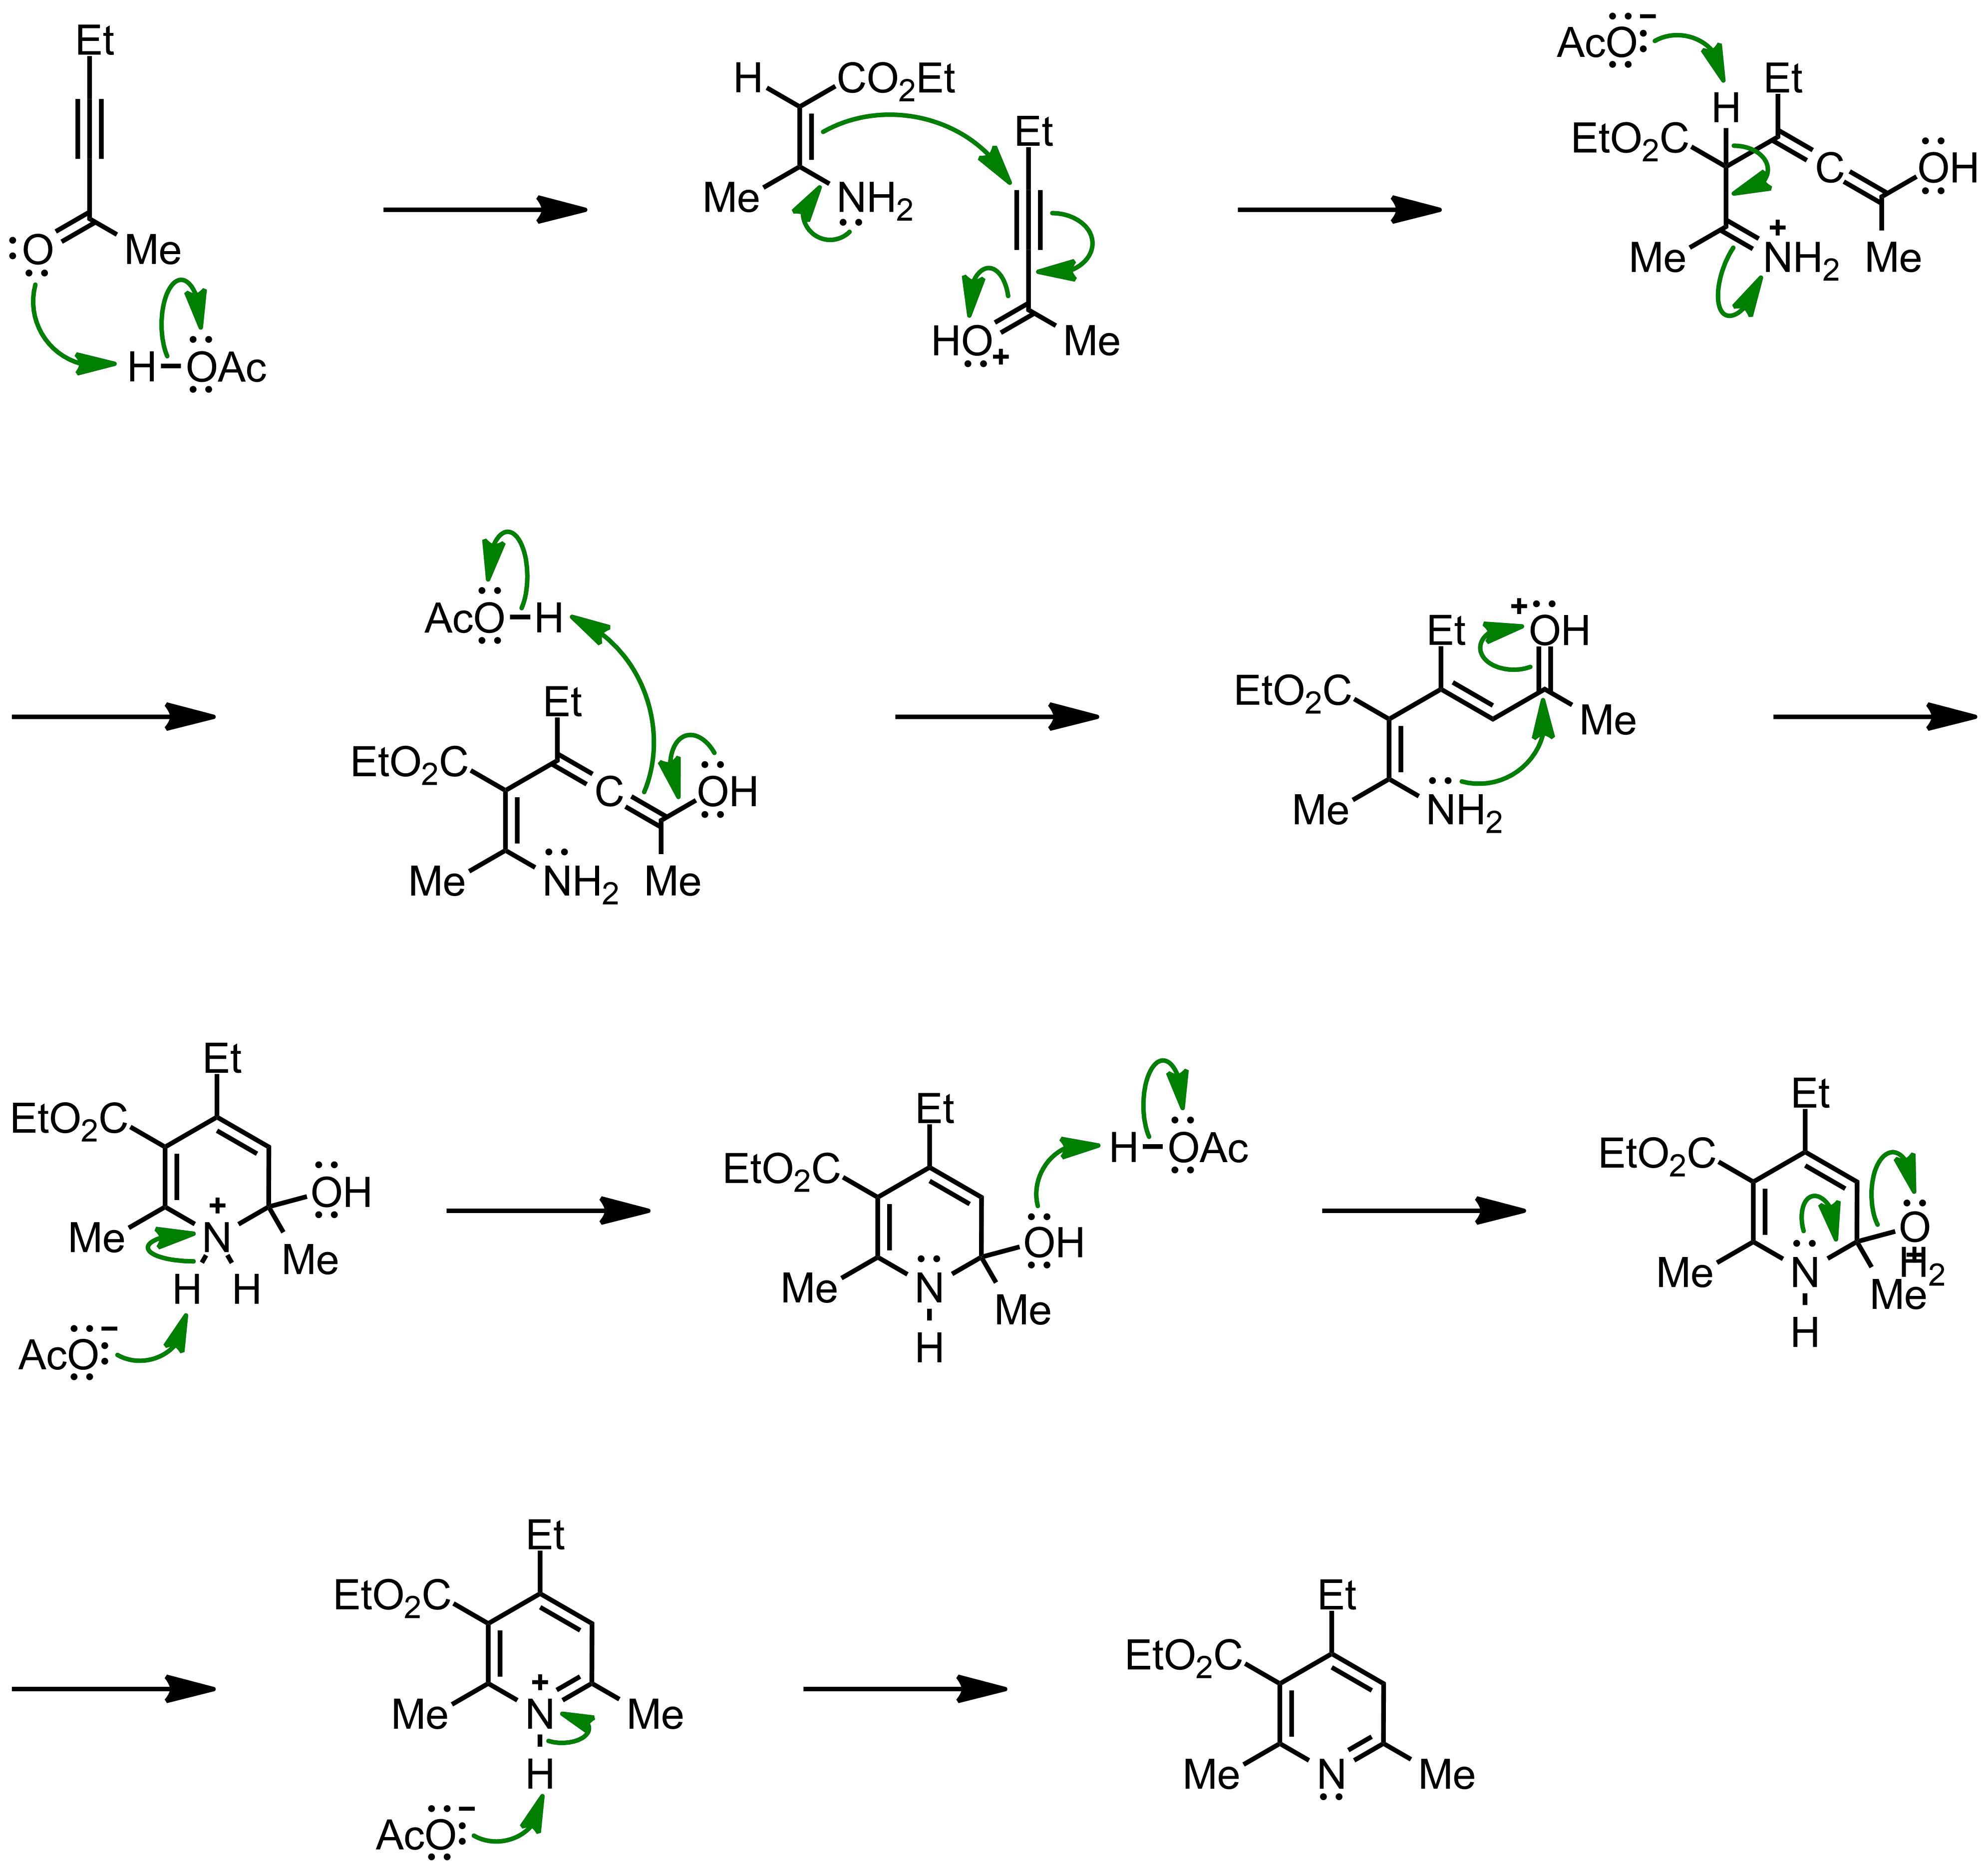 Mechanism of the Bohlmann-Rahtz Pyridine Synthesis